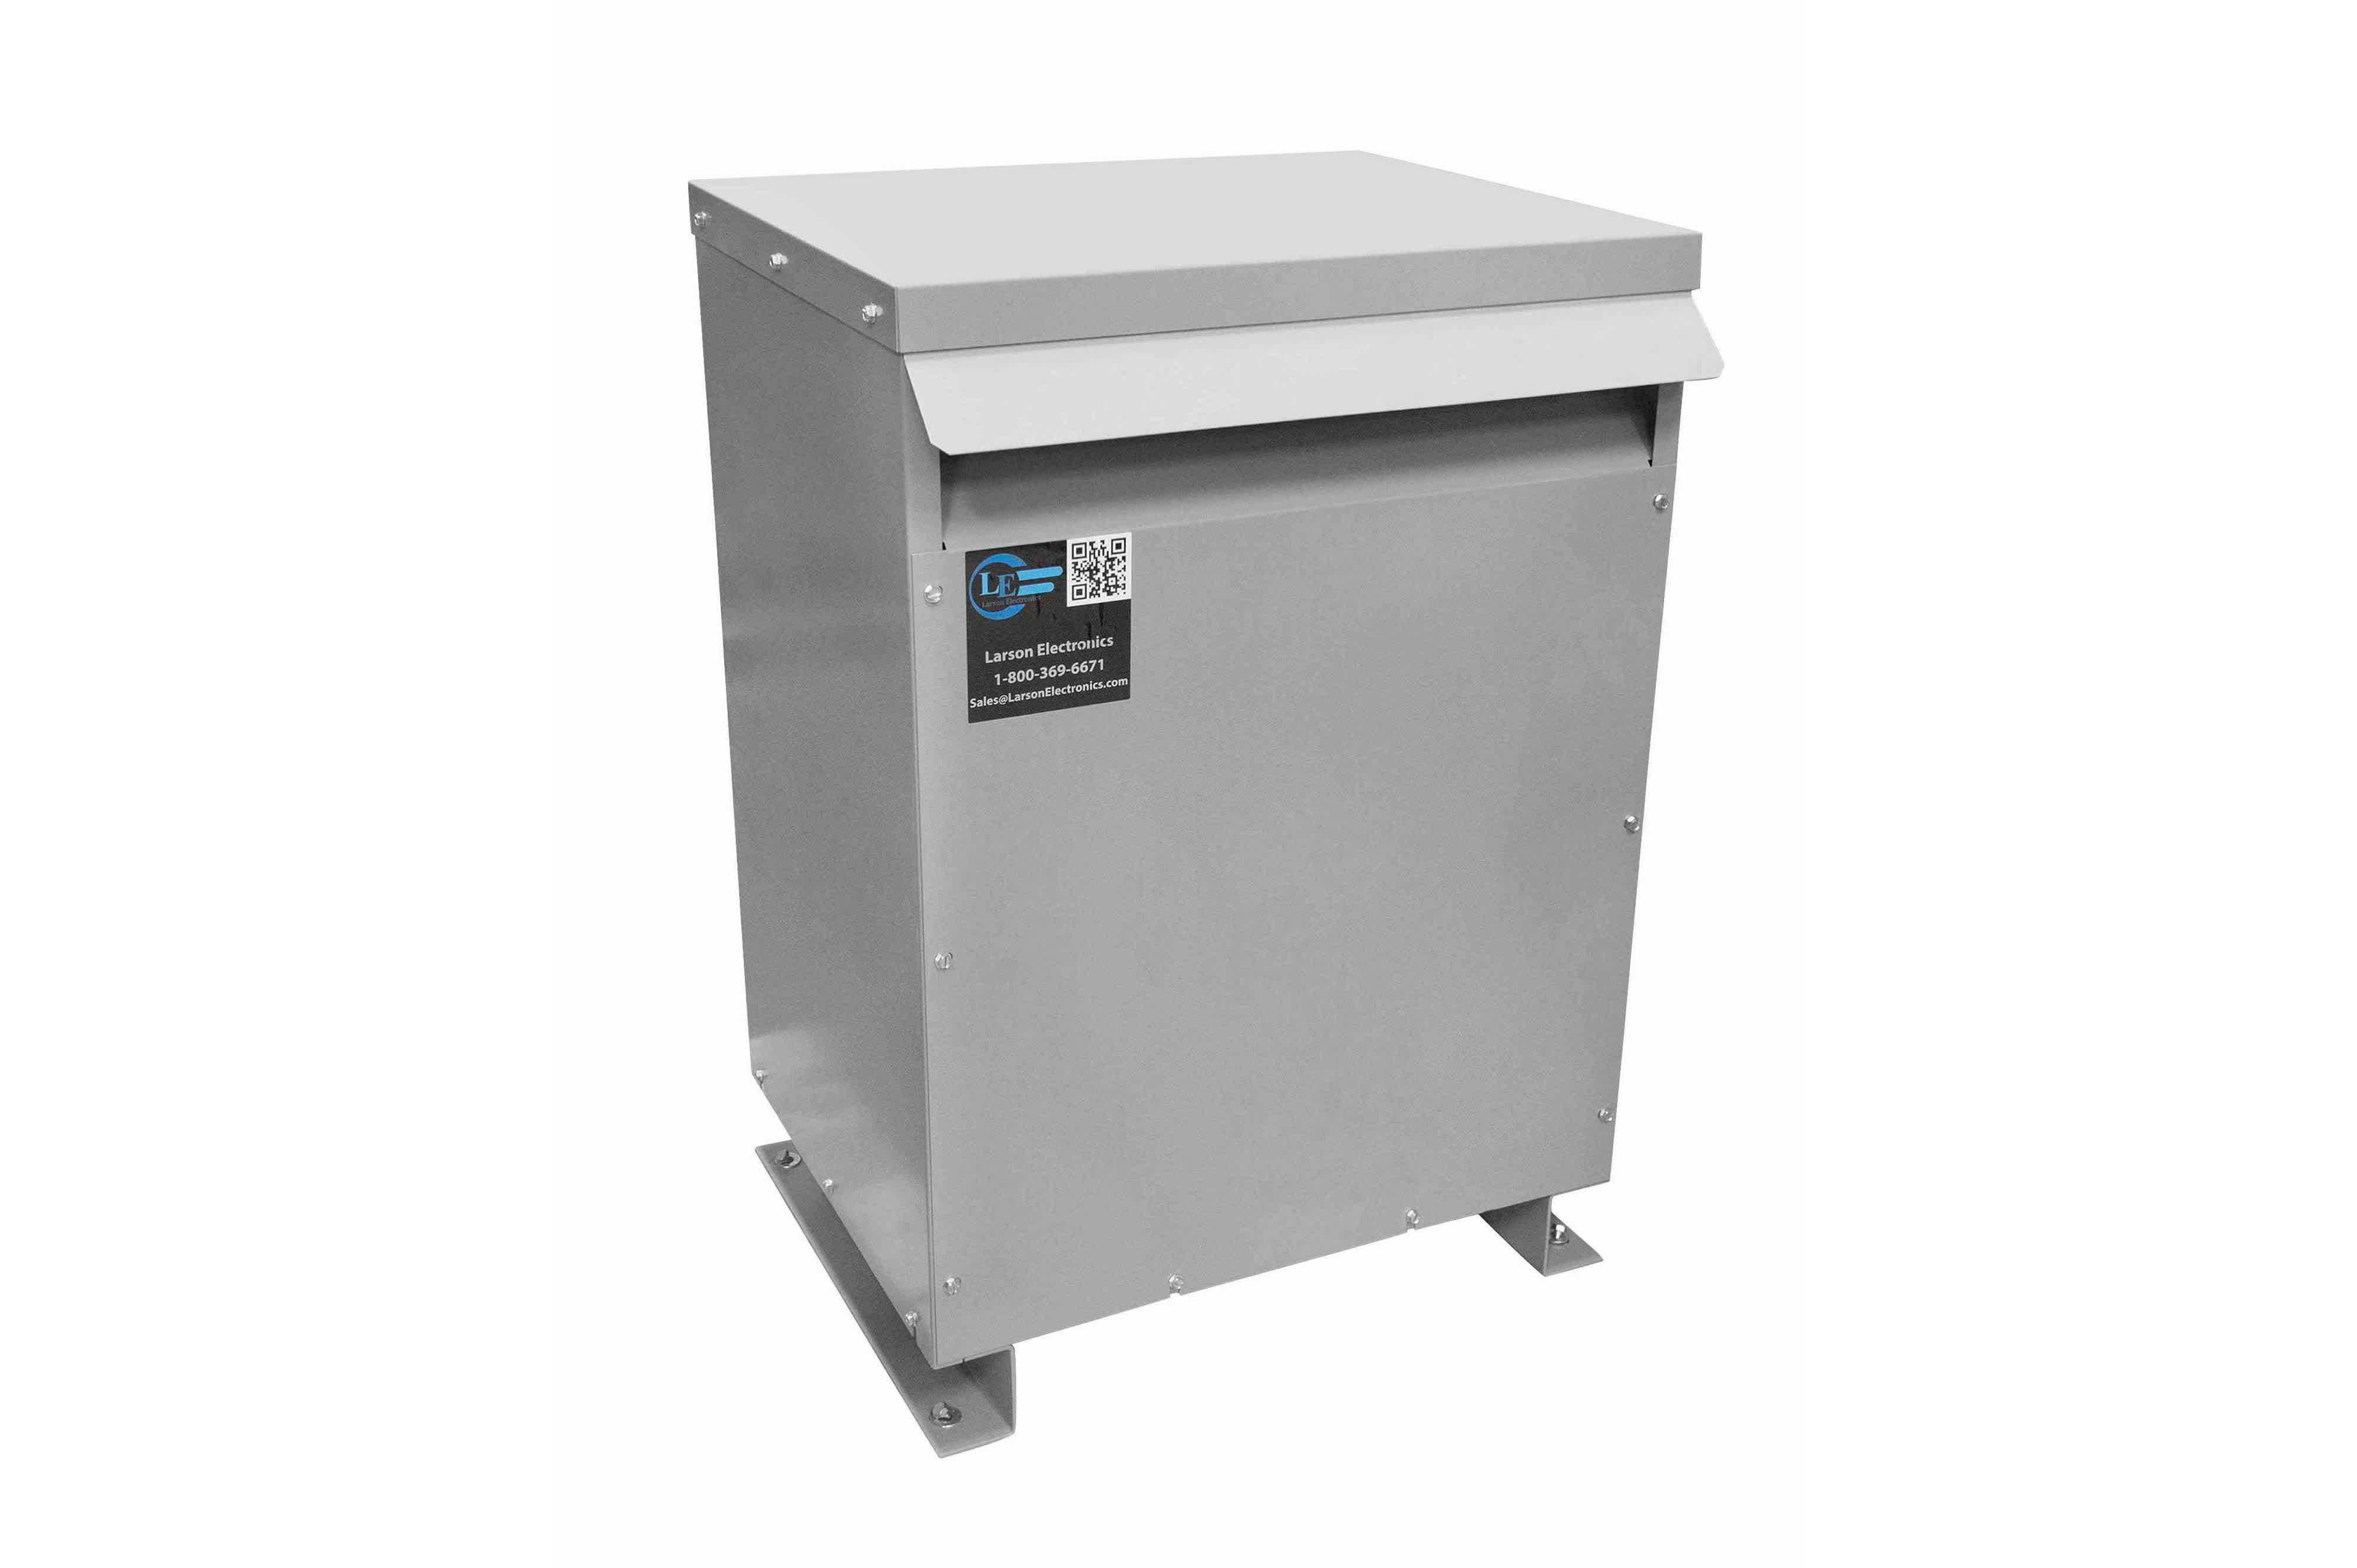 112.5 kVA 3PH Isolation Transformer, 400V Wye Primary, 600V Delta Secondary, N3R, Ventilated, 60 Hz